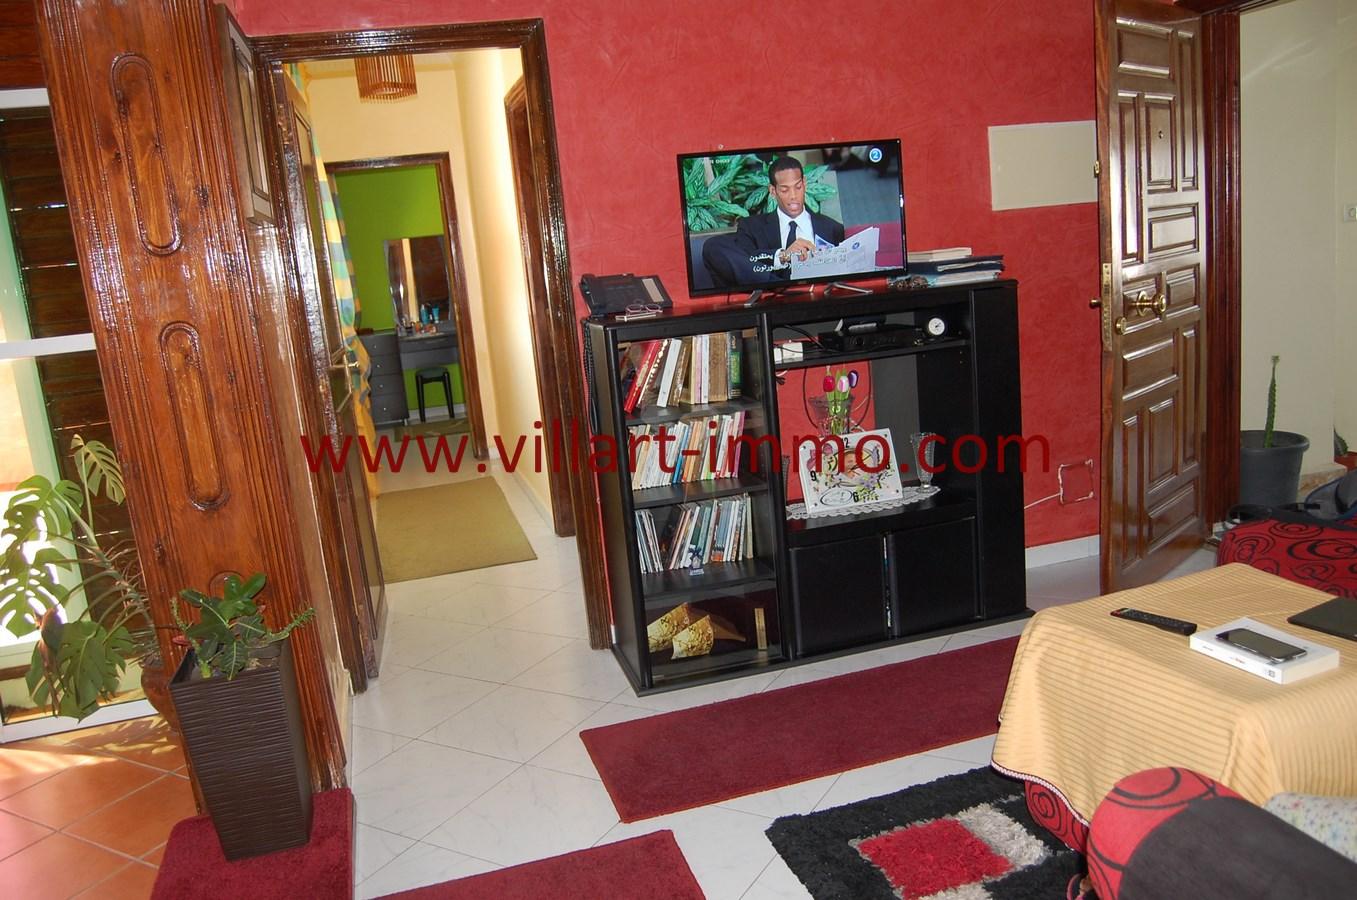 4-Vente-Appartement-Tanger-Centre-Ville-Séjour-VA505-Villart Immo